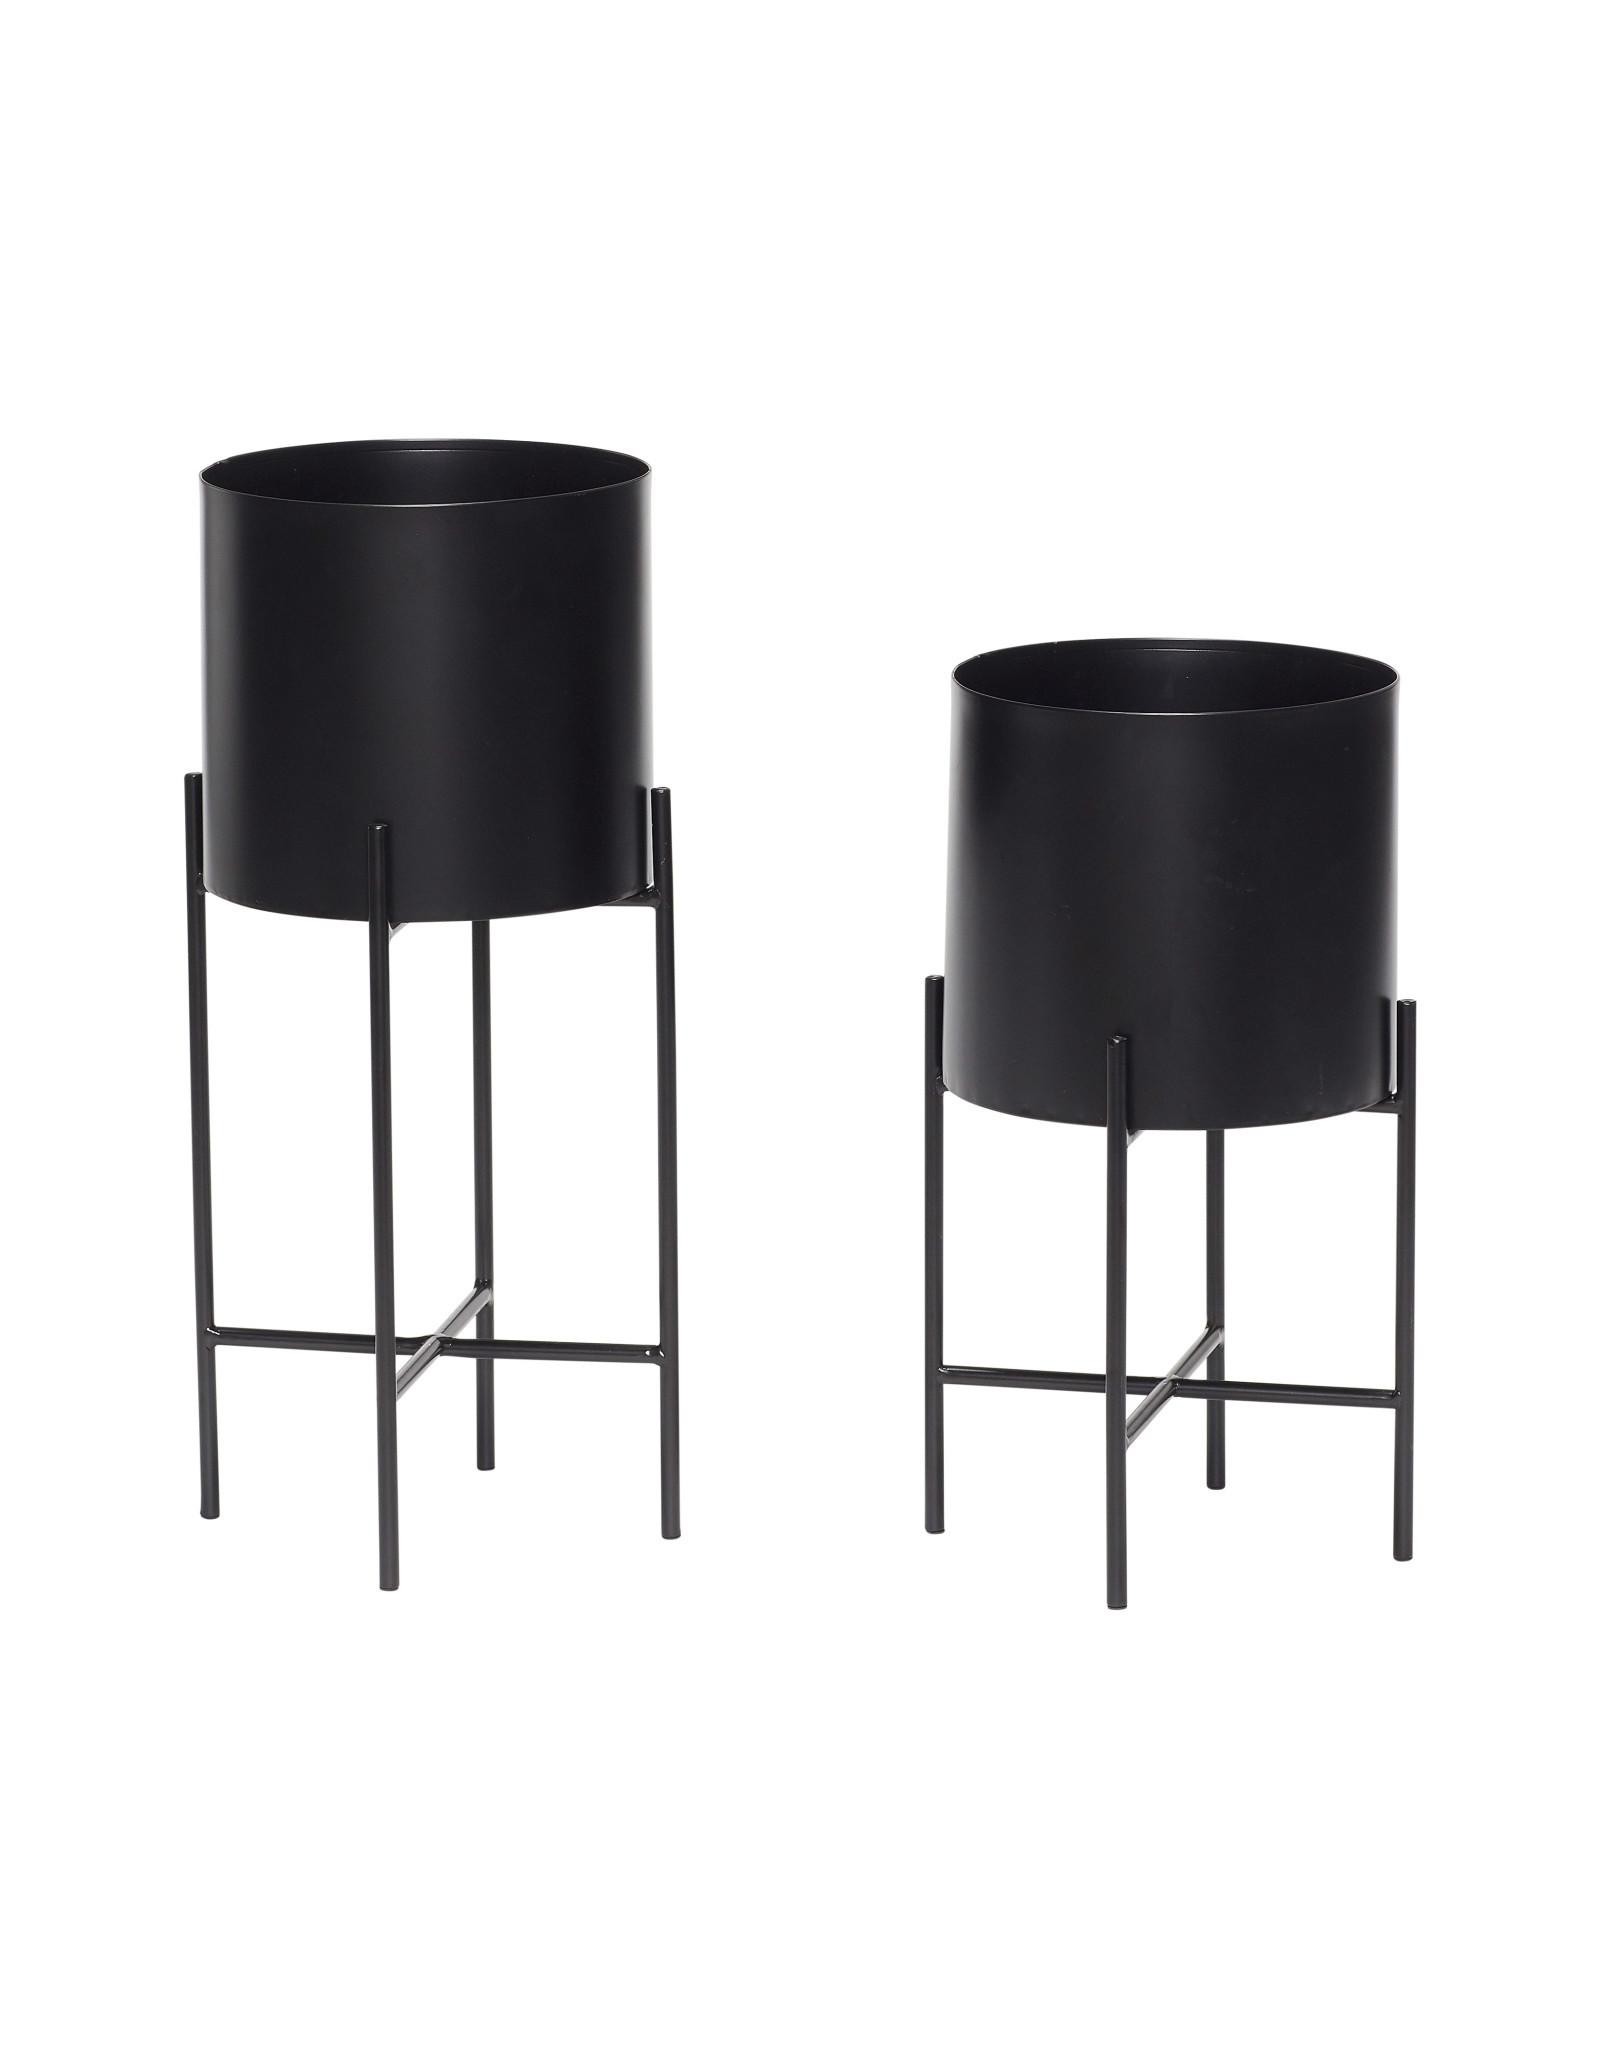 Hübsch Black Pot w/ legs ø25xh55